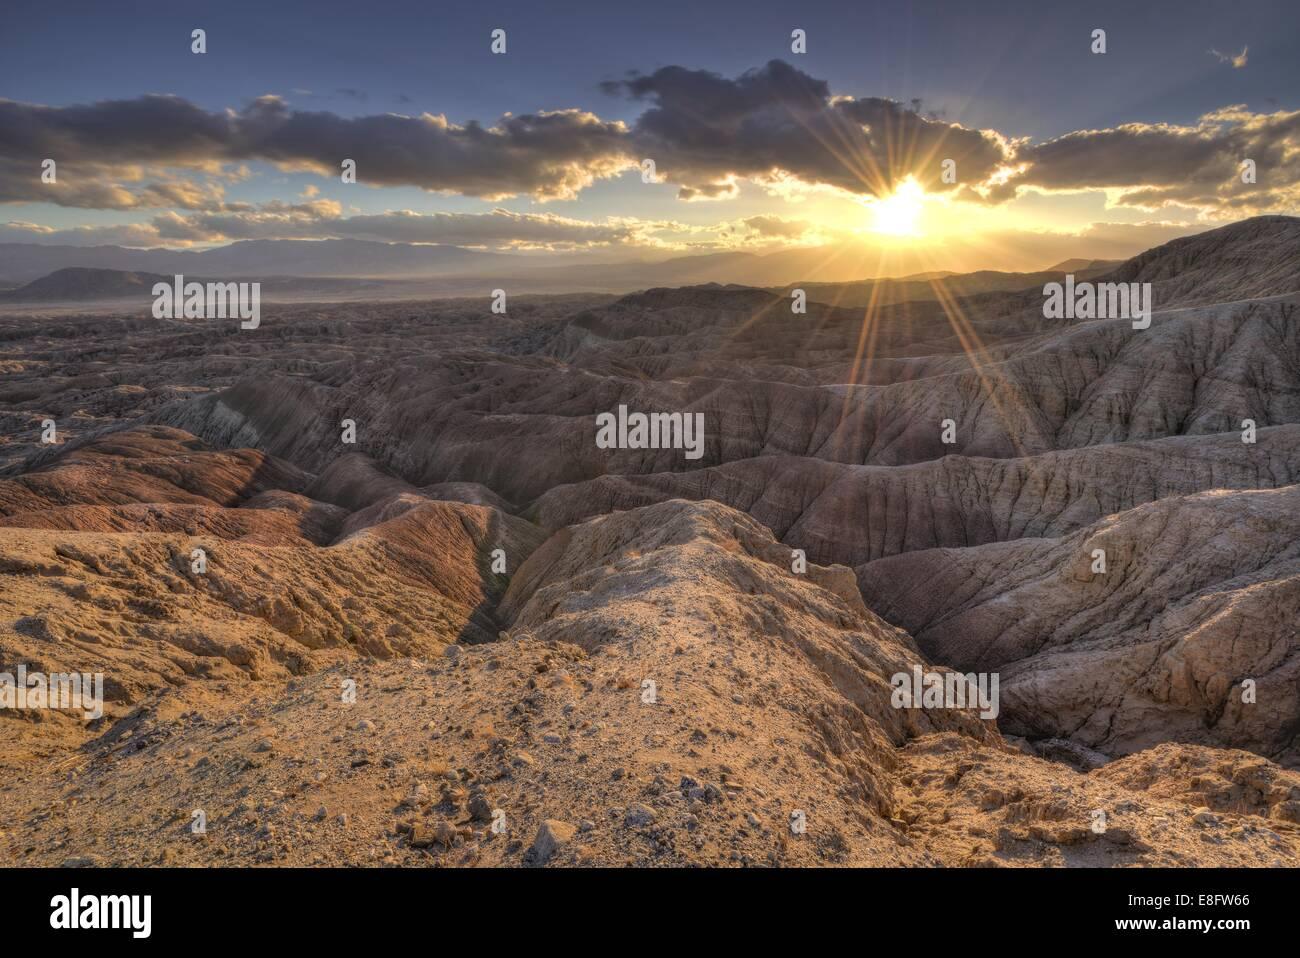 USA, California, Anza-Borrego Desert State Park, Sunset in Badlands - Stock Image